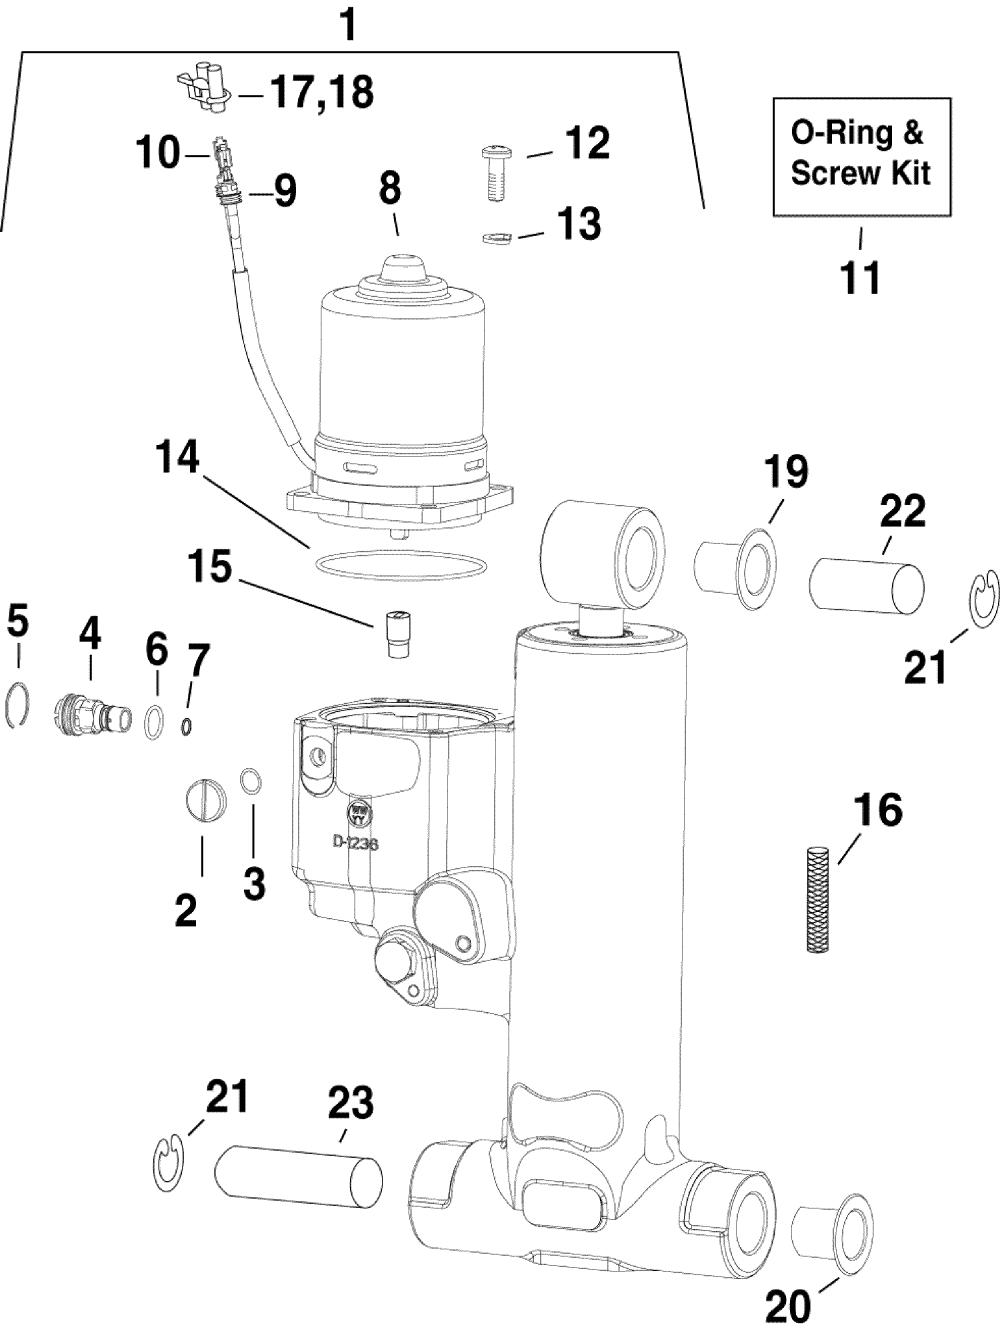 medium resolution of brp evinrude en 2010 90 e90dslise trim tilt hydraulic assembly